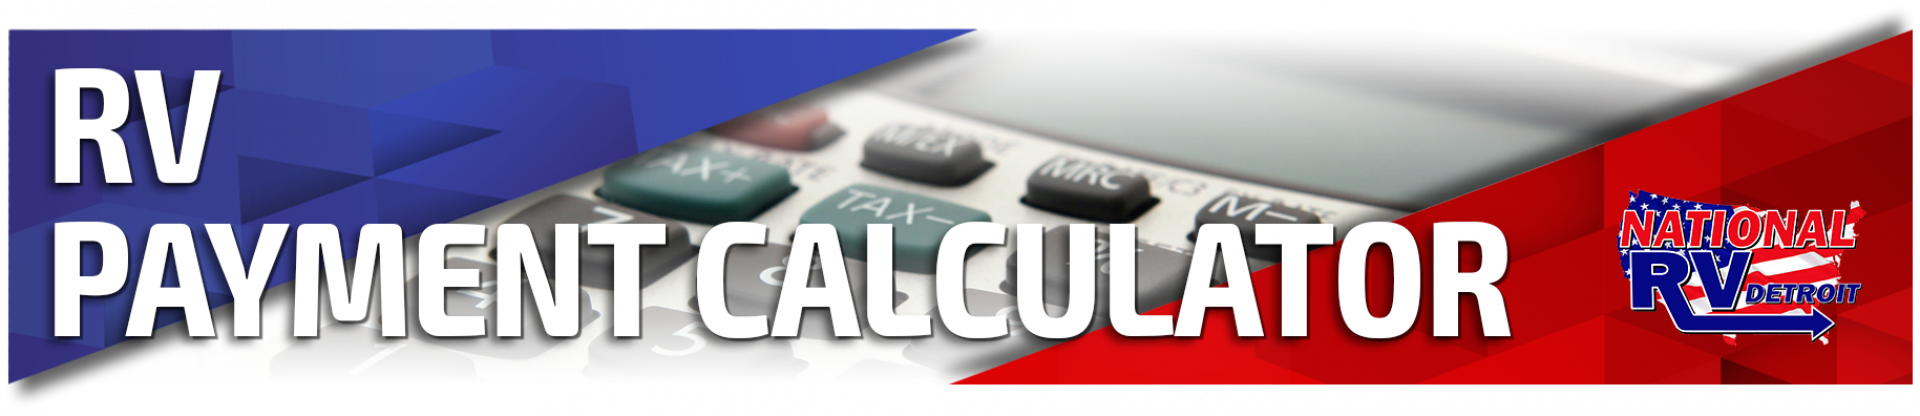 RV Payment Calculator National RV Detroit